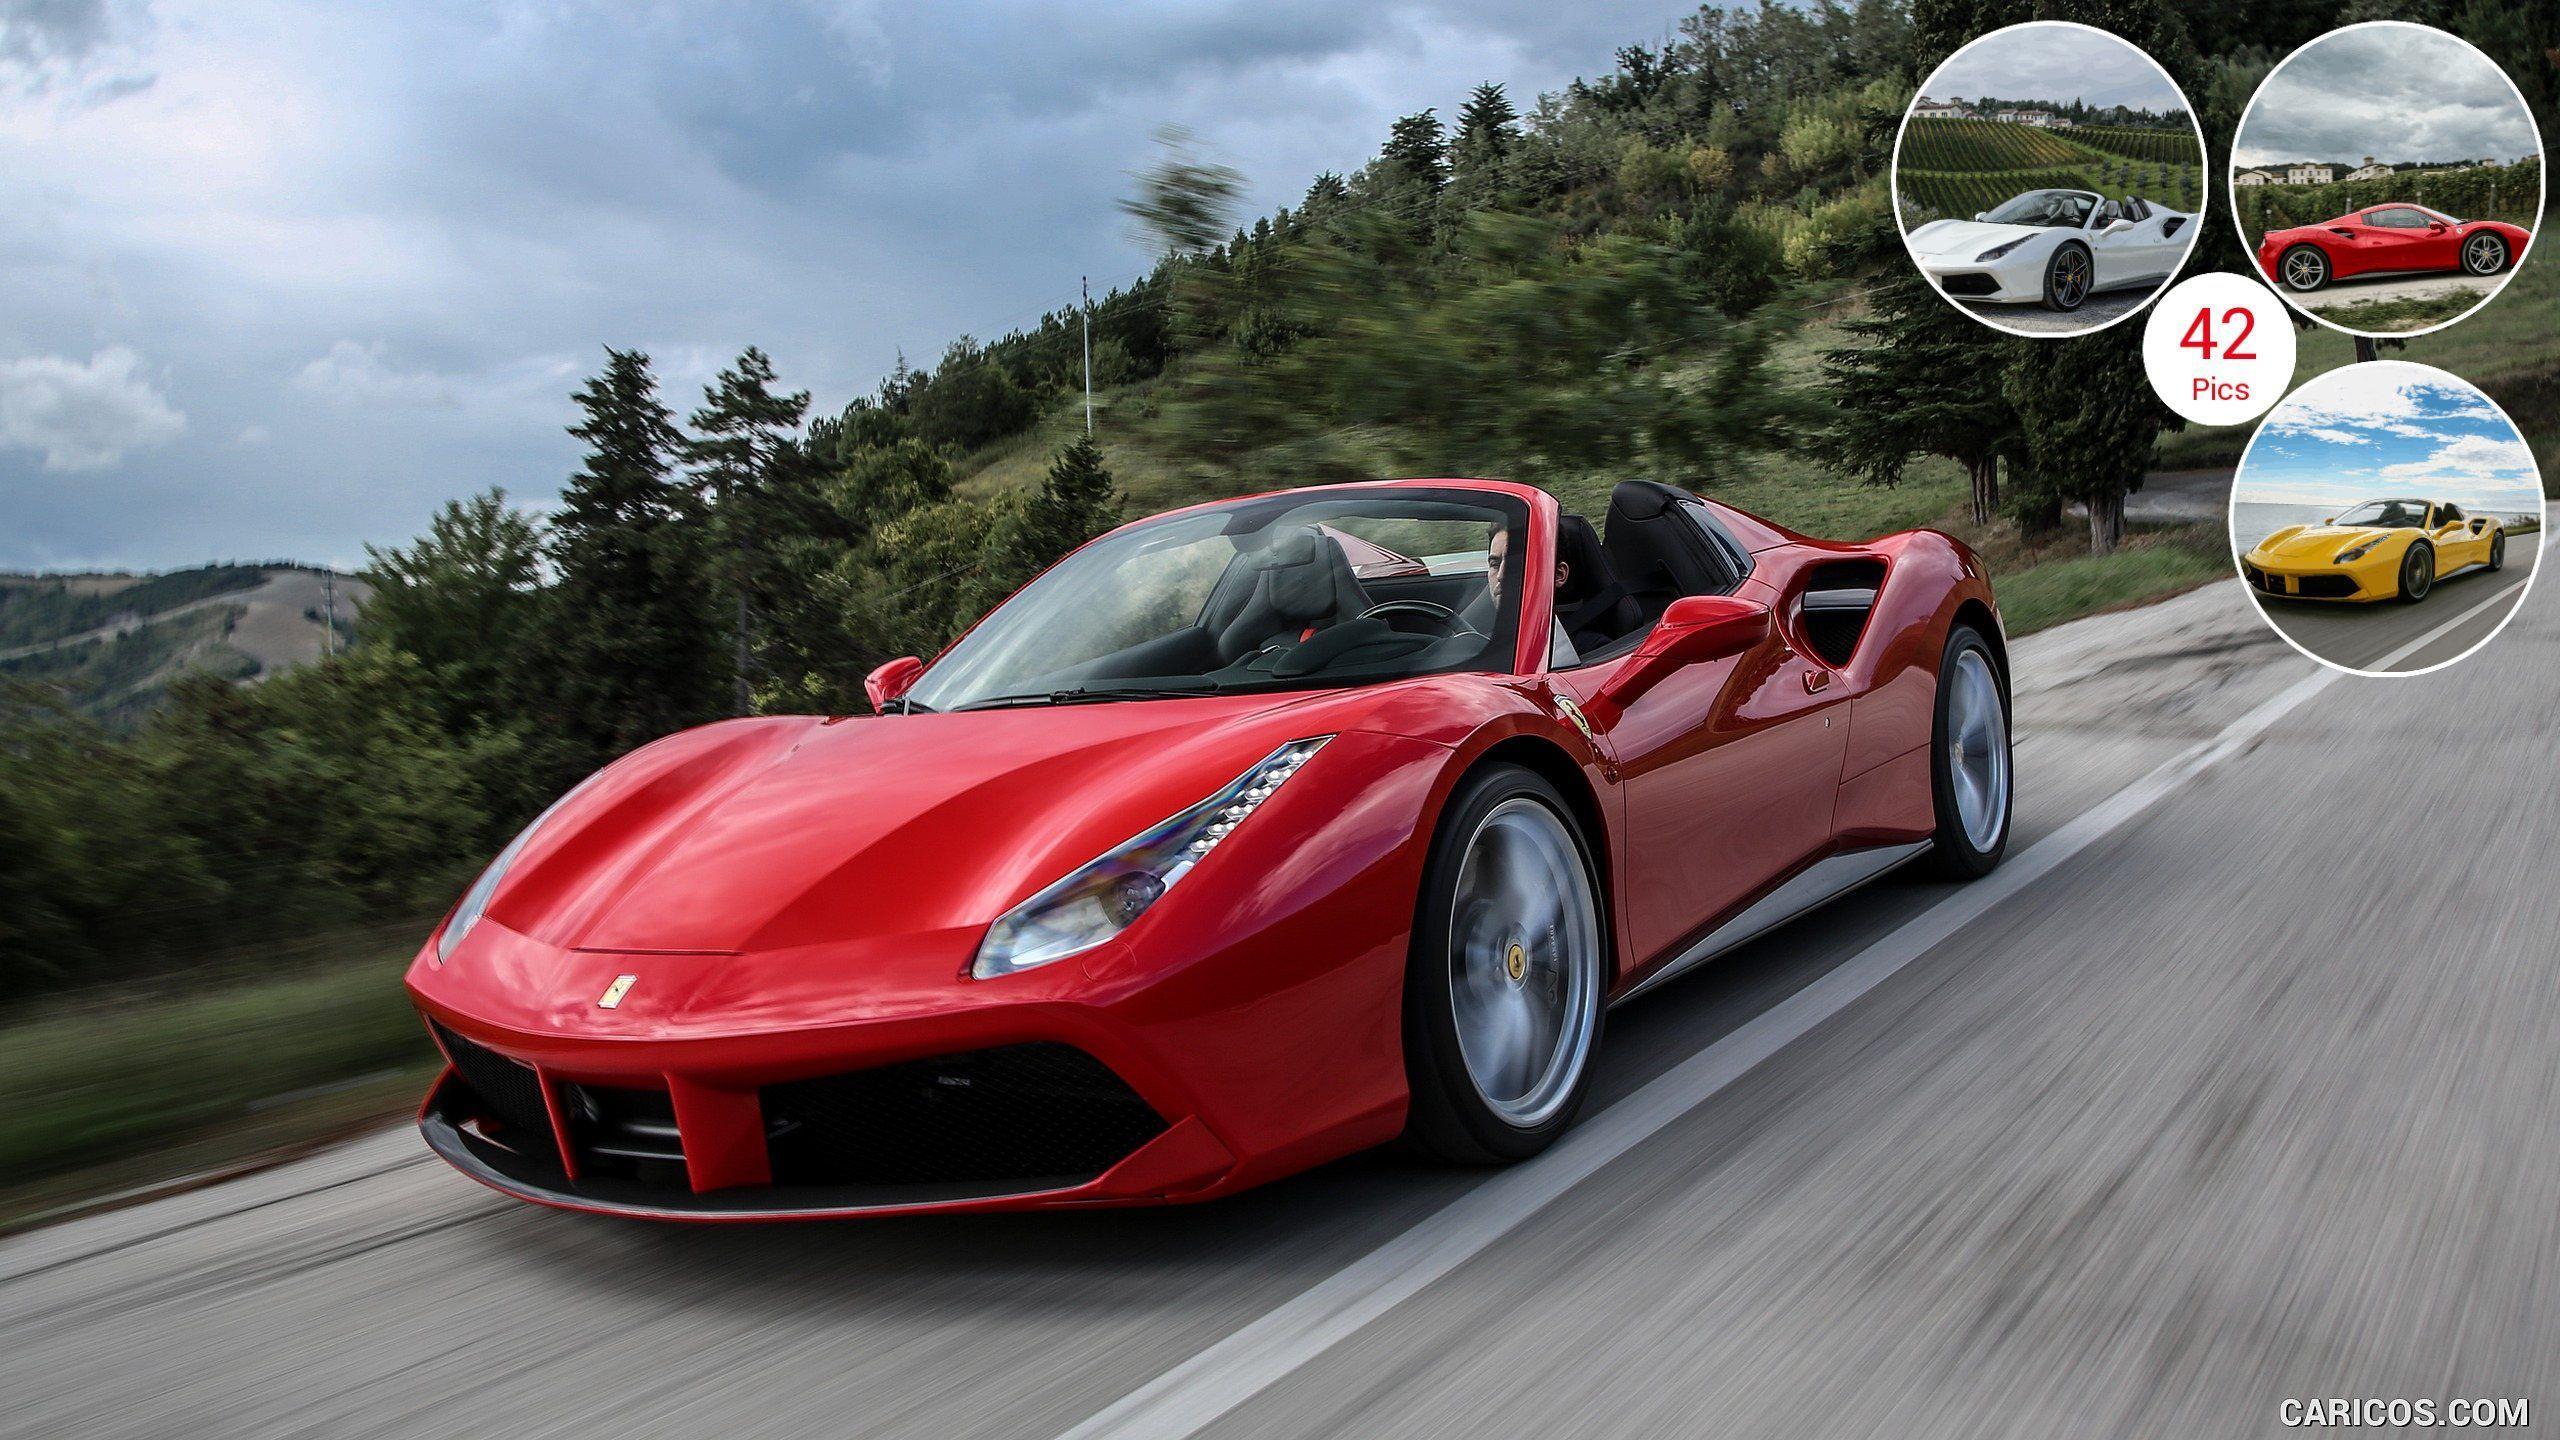 Ferrari 488 Wallpapers Top Free Ferrari 488 Backgrounds